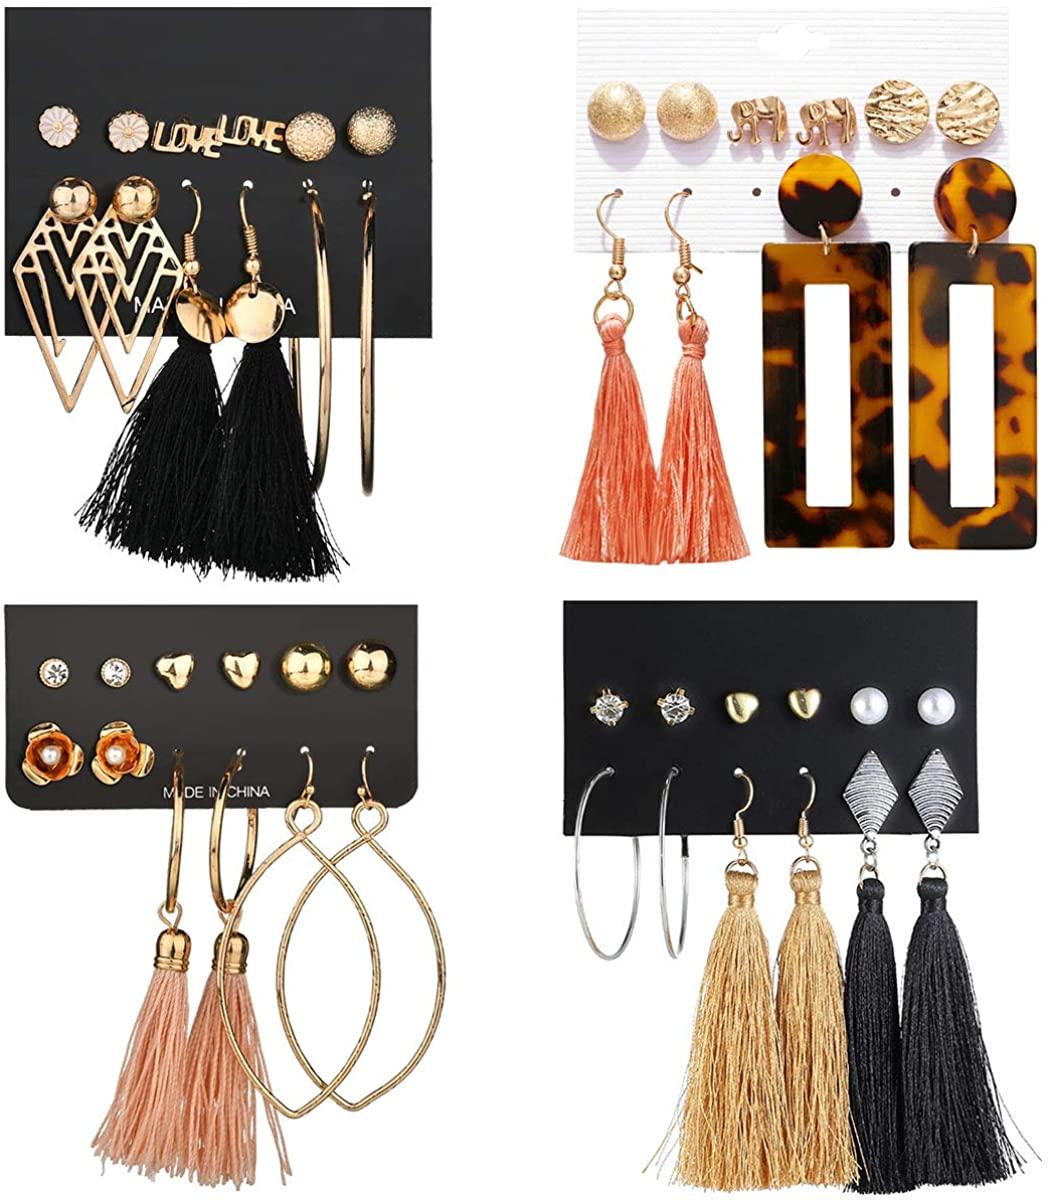 WAINIS 23-44 Pairs Assorted Multiple Stud Hoop Dangle Earrings Set Women Girls Acrylic Round Ball CZ Bohemian Long Tassel Drop Earrings Pack